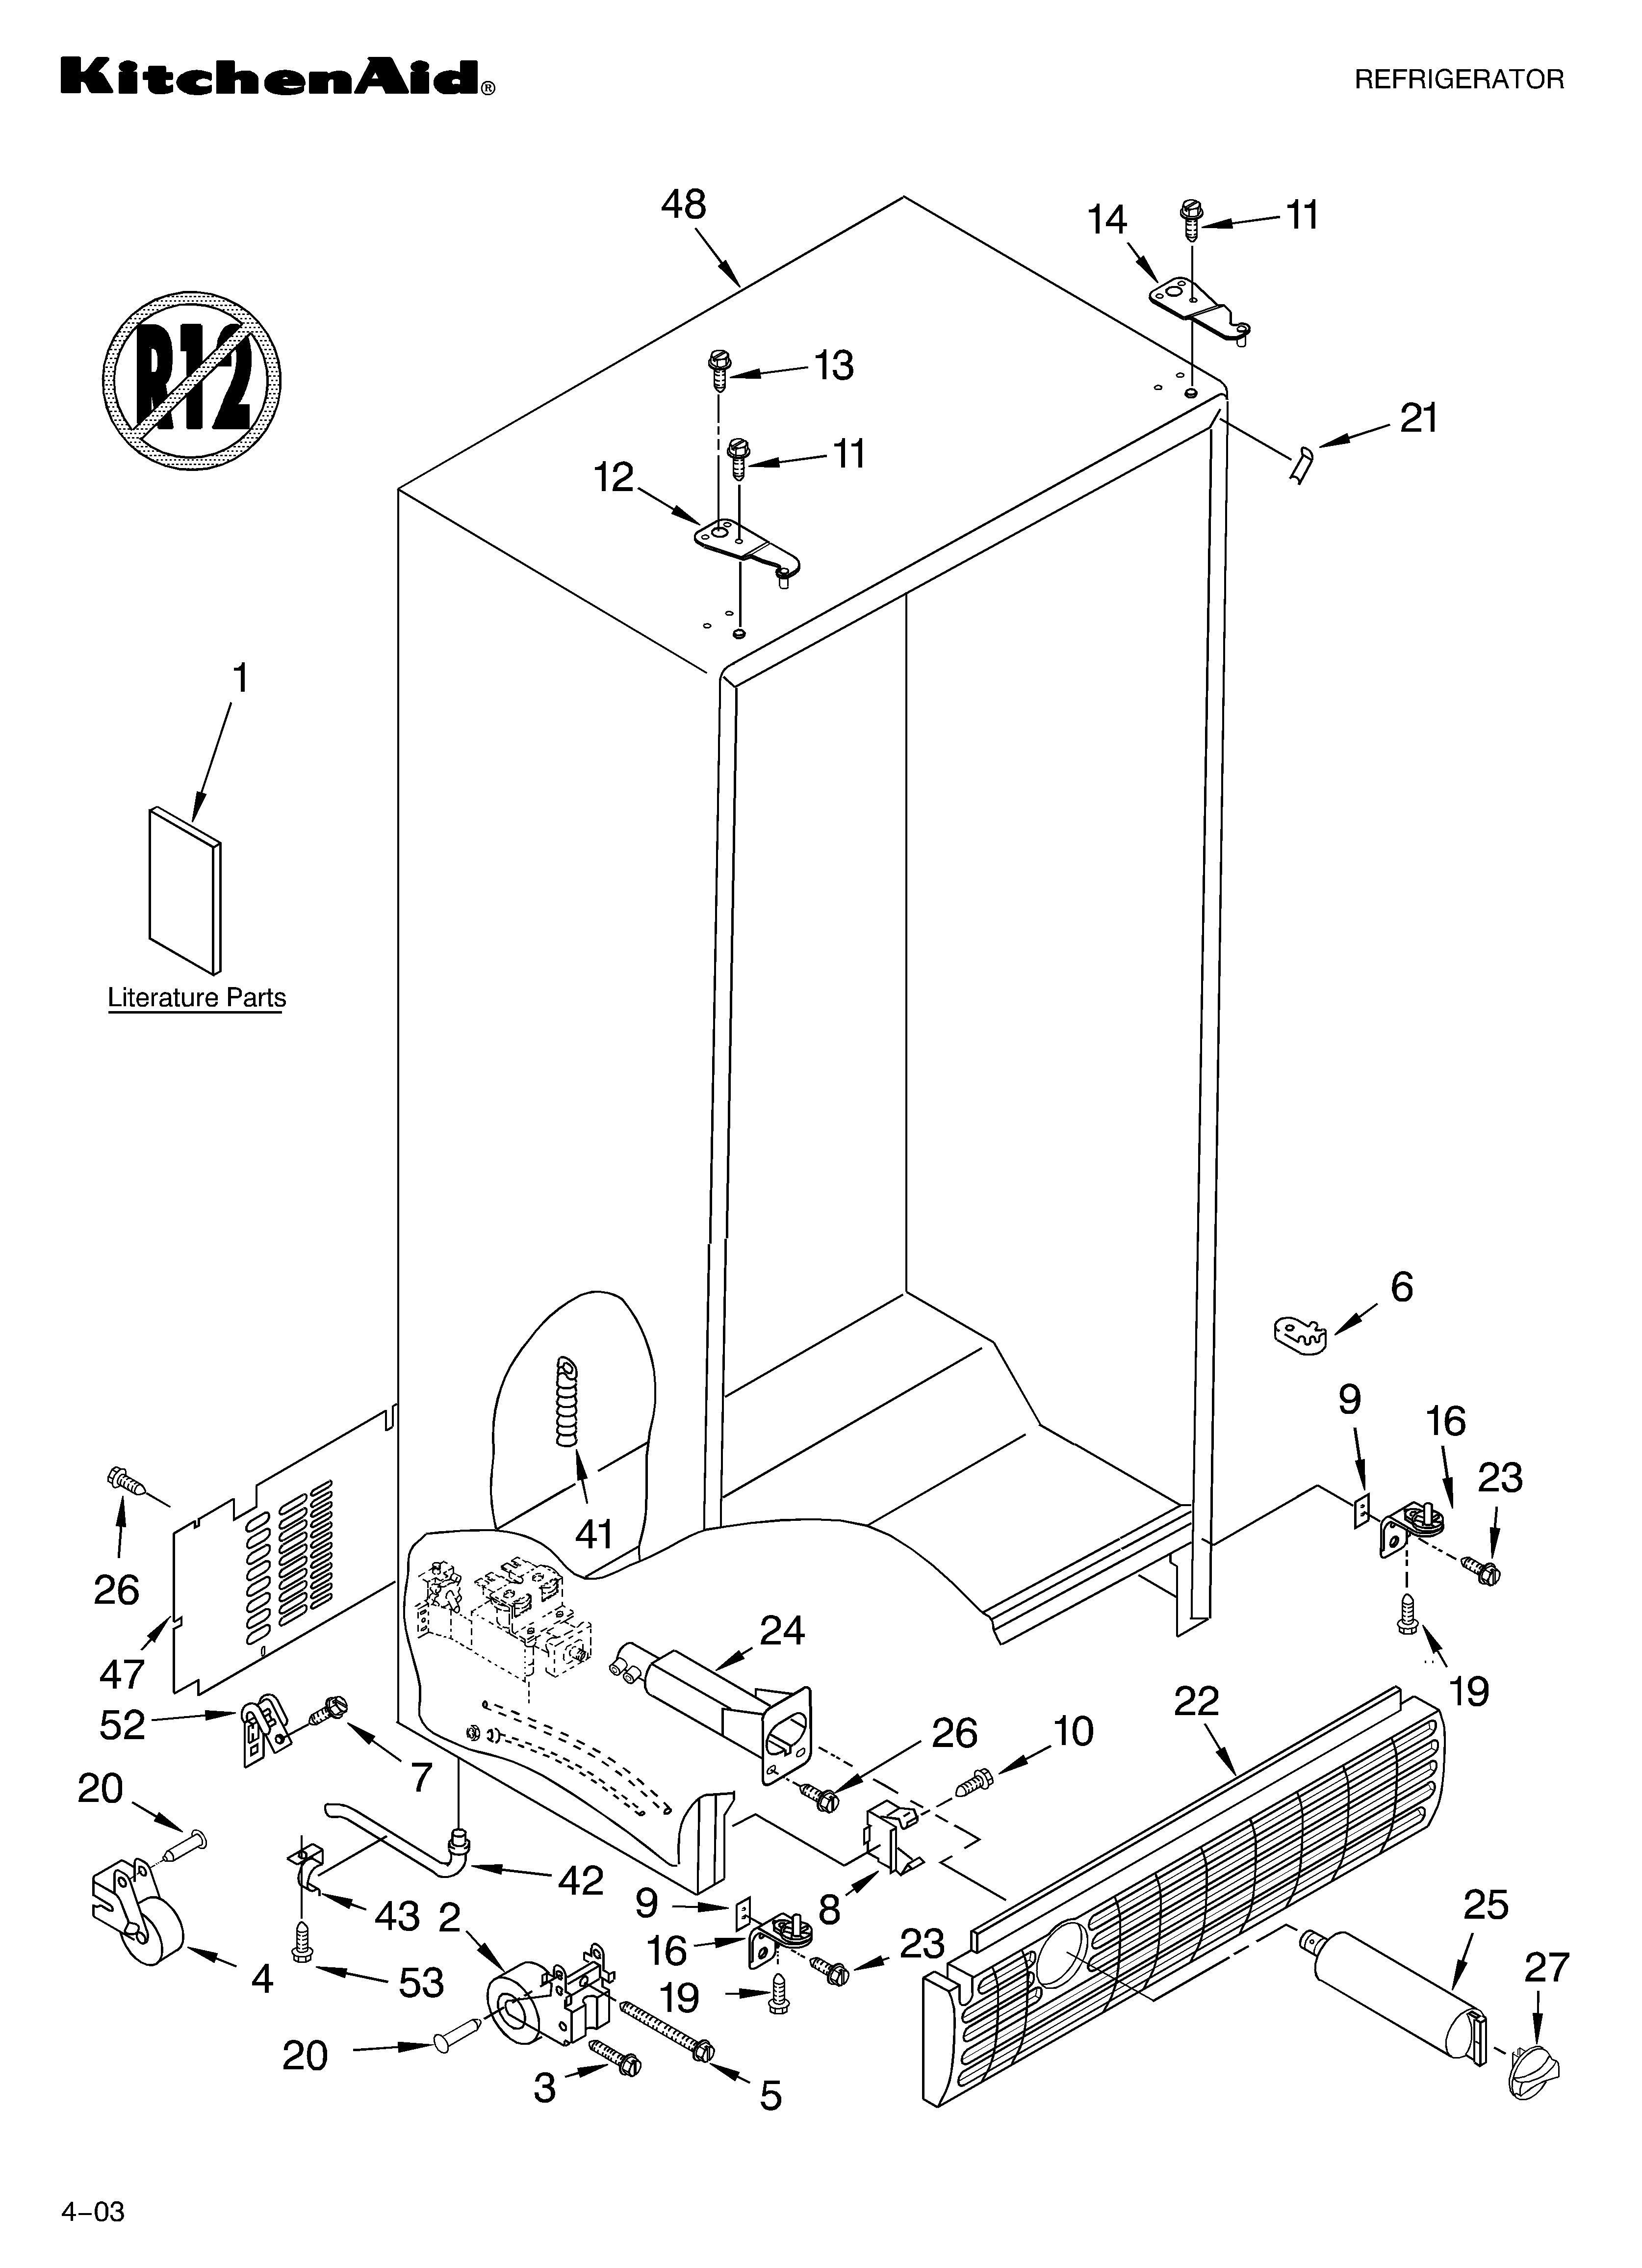 50 Kitchenaid Superba Refrigerator Parts Diagram Up2n Di 2020